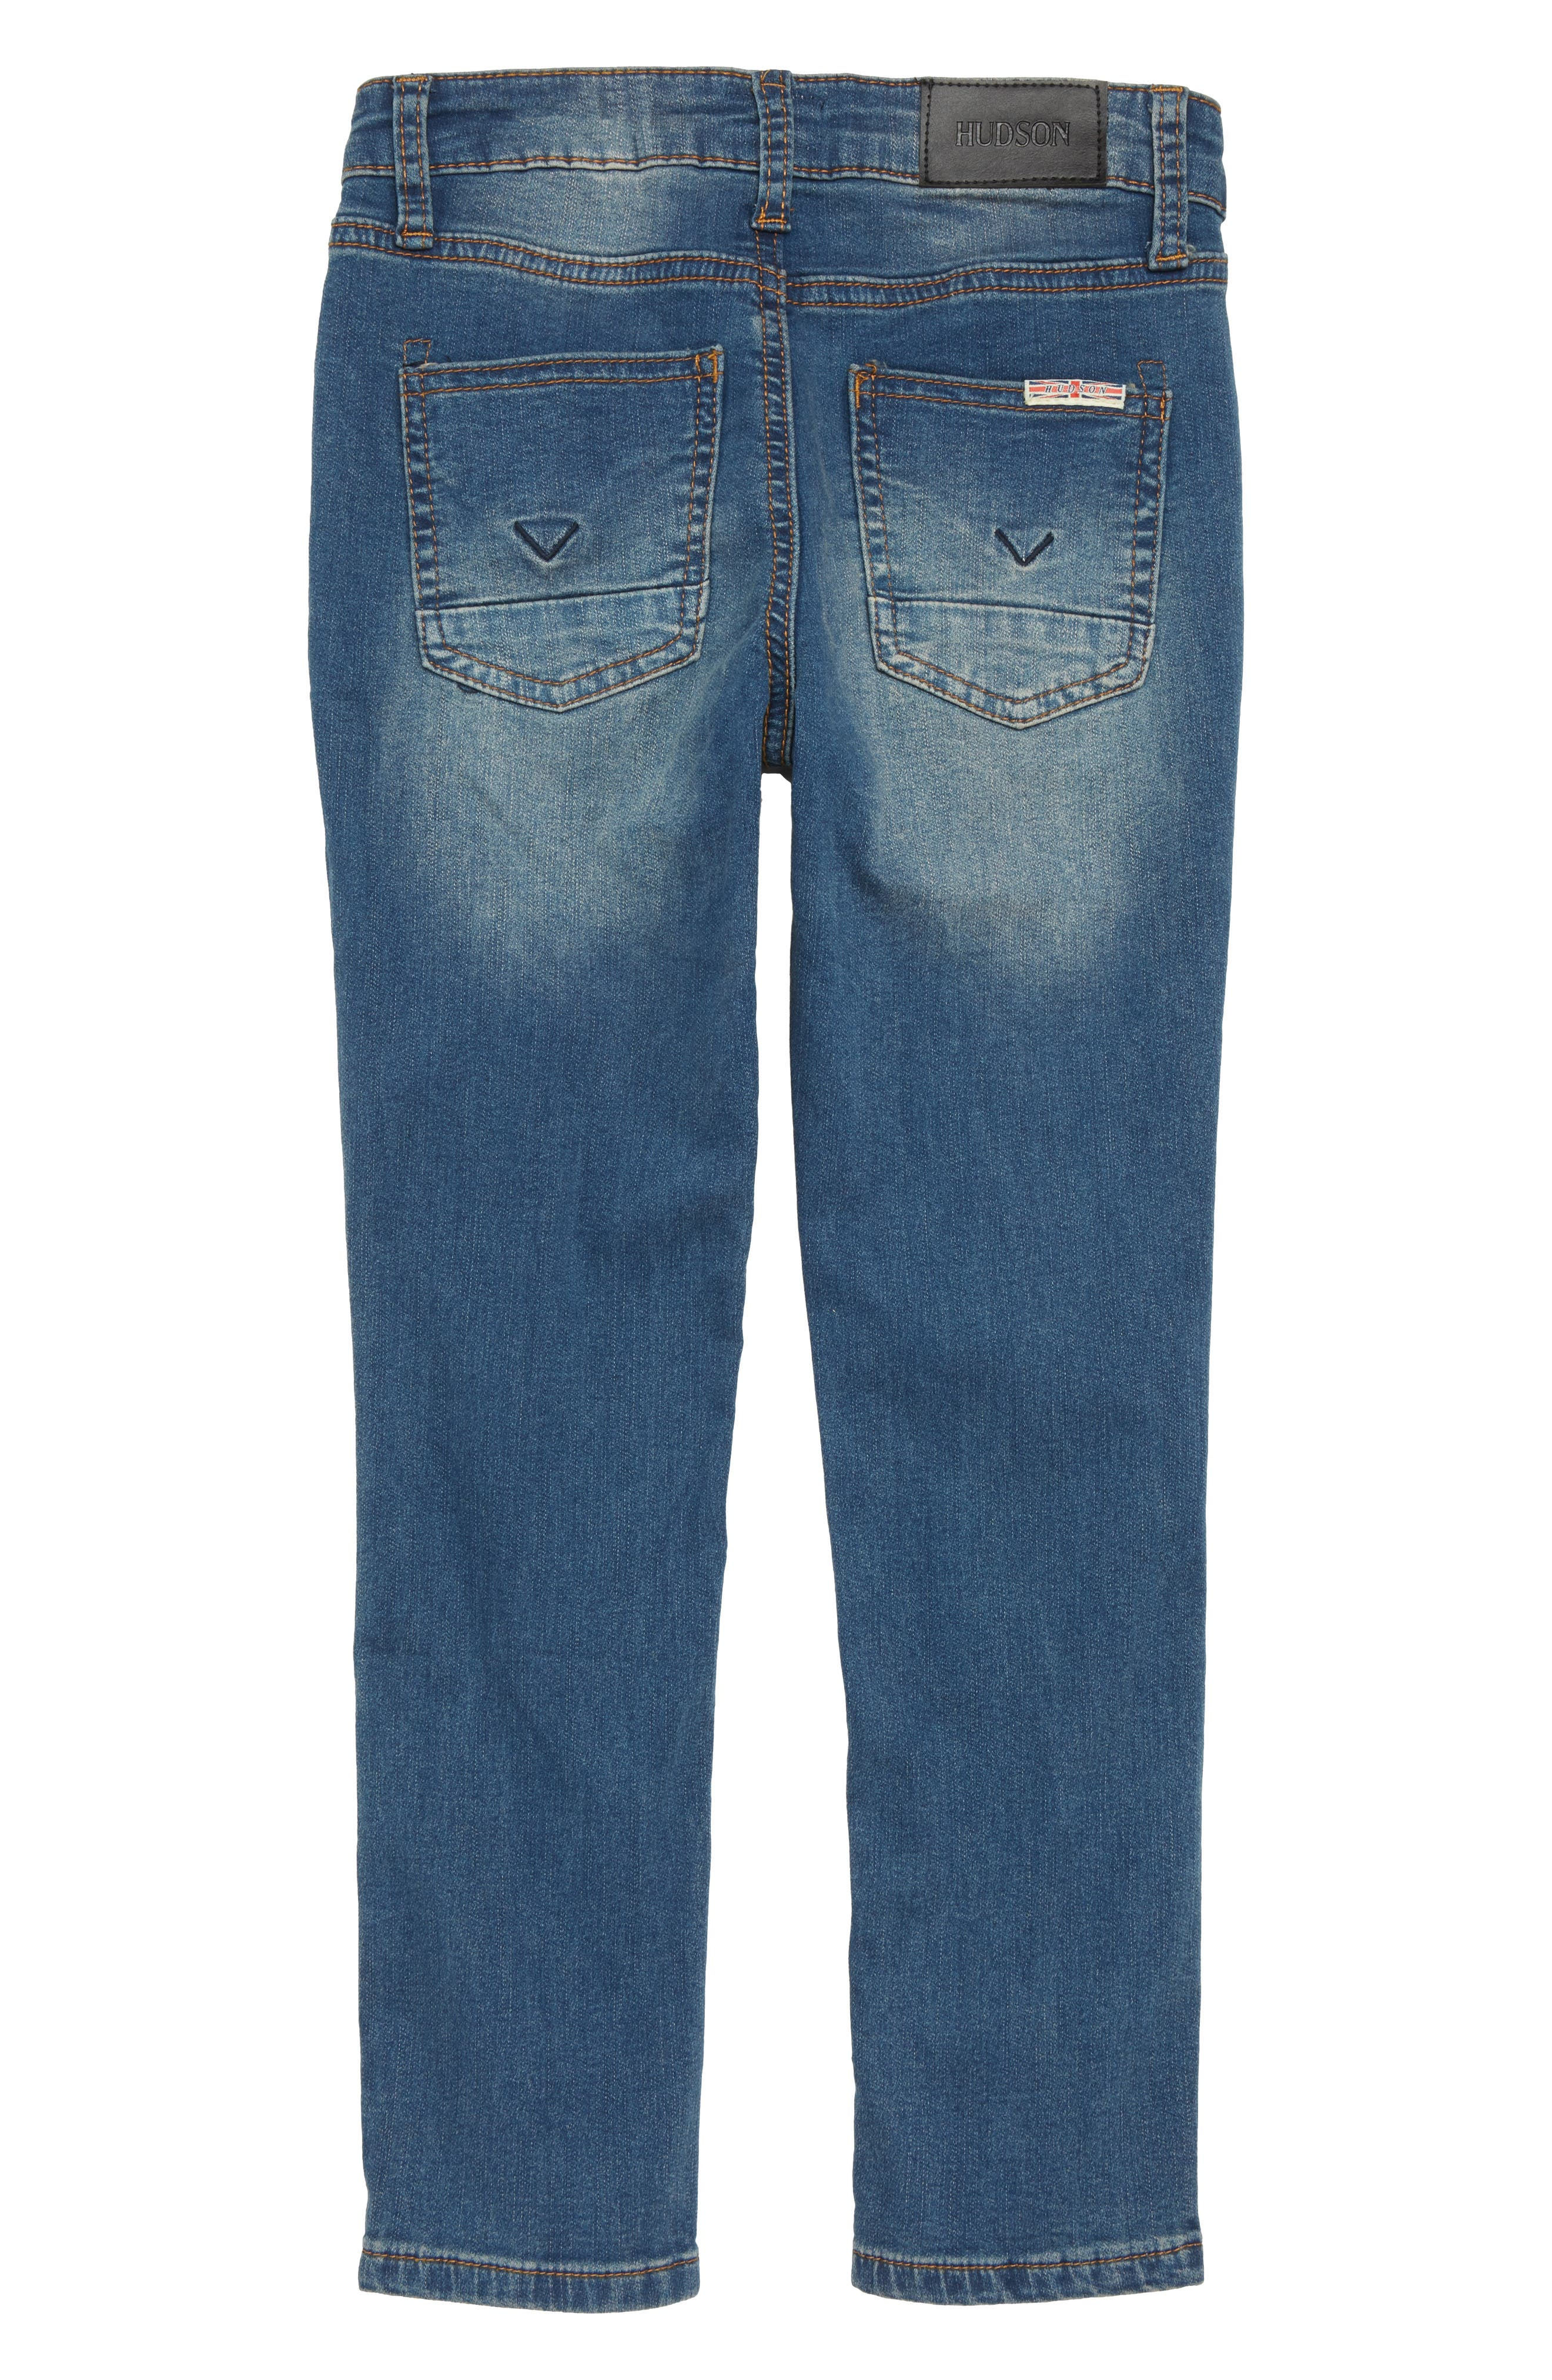 HUDSON KIDS,                             Jagger Slim Fit Straight Leg Jeans,                             Alternate thumbnail 2, color,                             458